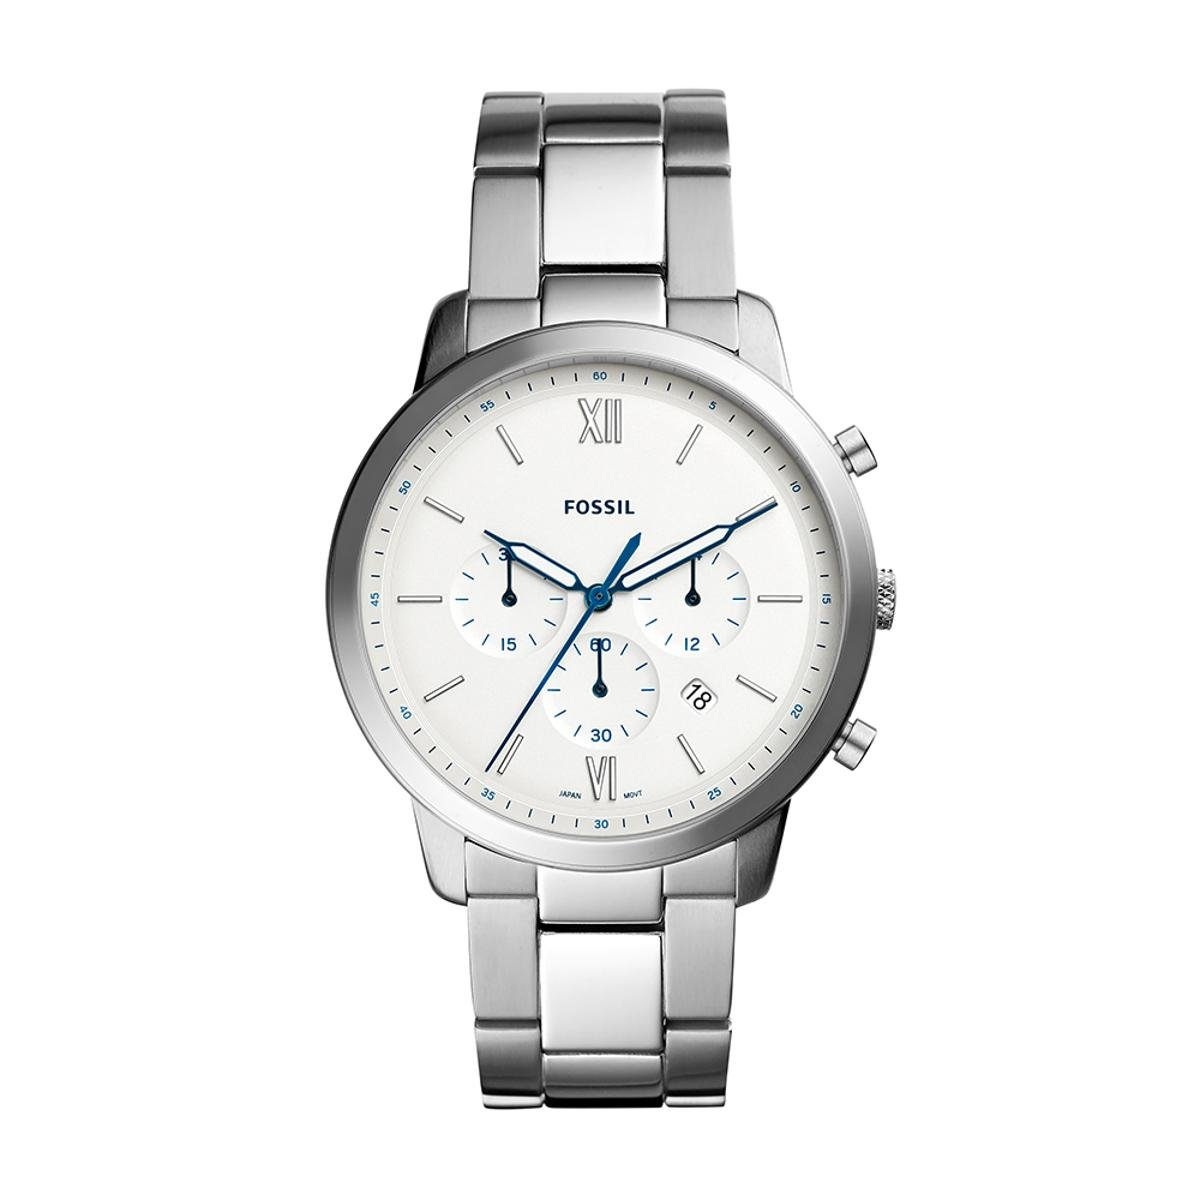 dcf6ae7c40c Relógio Fossil Masculino Neutra Chrono - FS5433 1KN FS5433 1KN - Prata -  Compre Agora